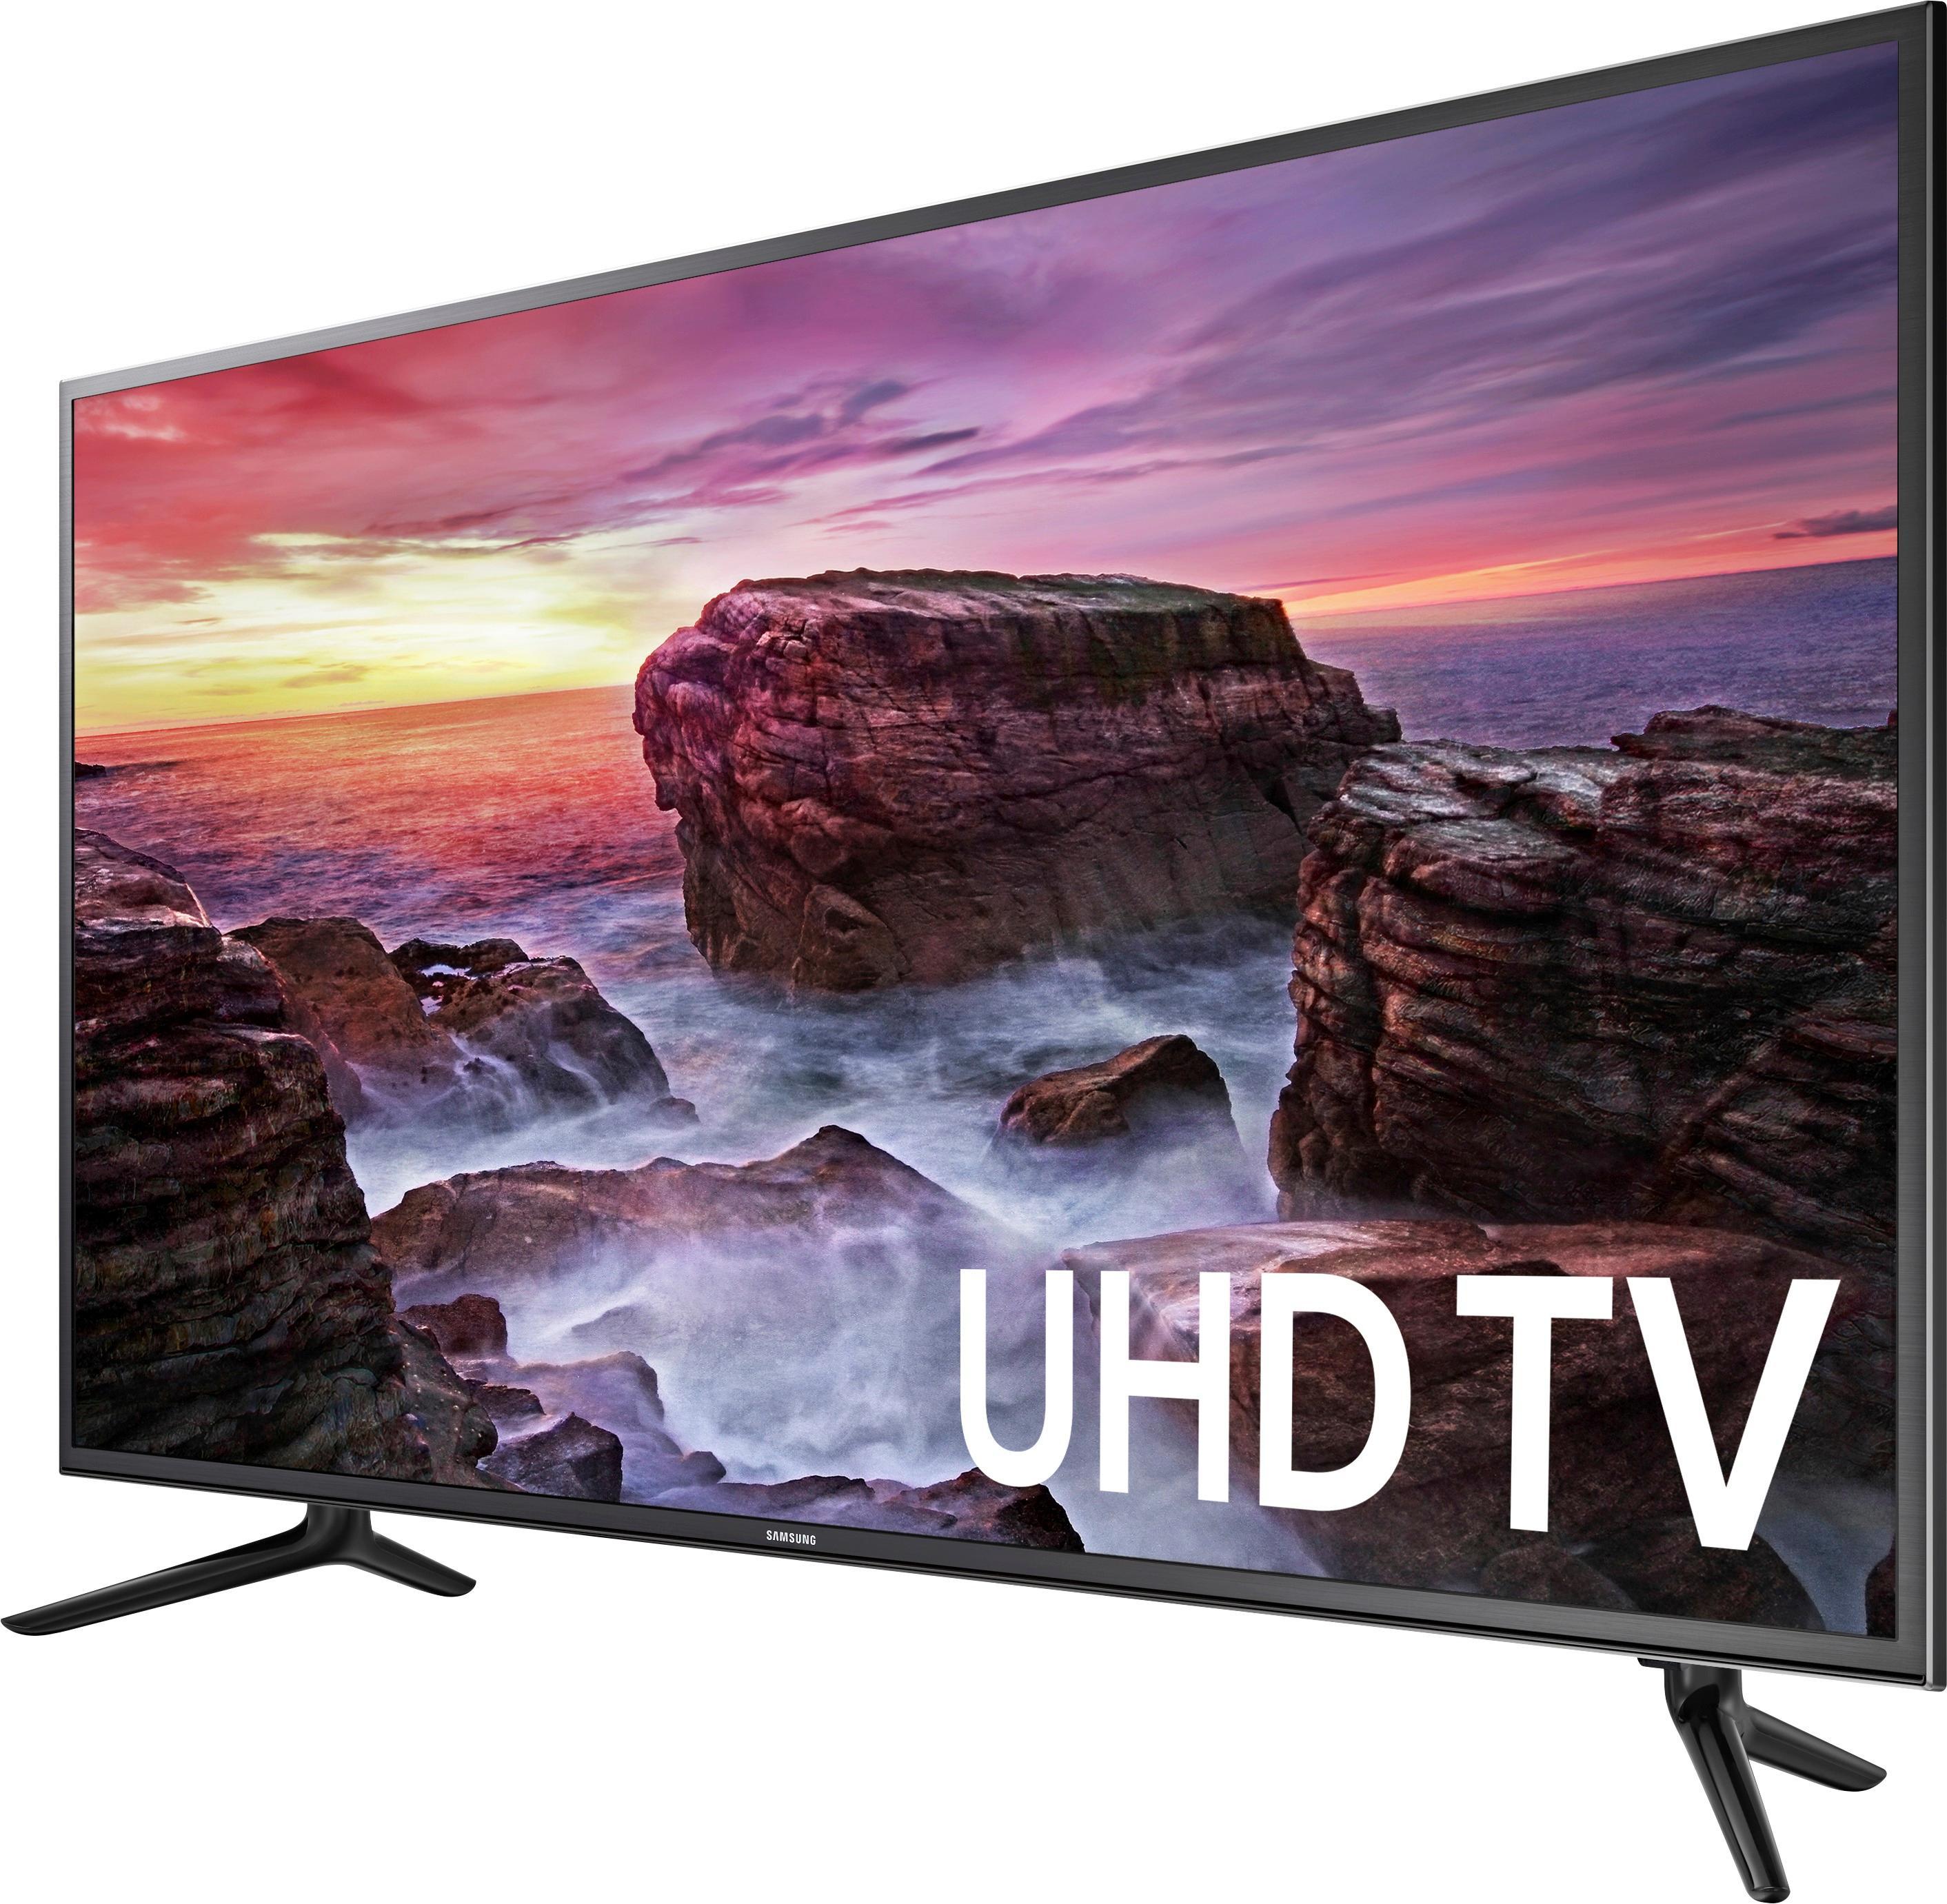 "Samsung UN58MU6100FXZA 58"" Class (57.5"" Diag.) LED 2160p Smart 4K Ultra HD TV Black"